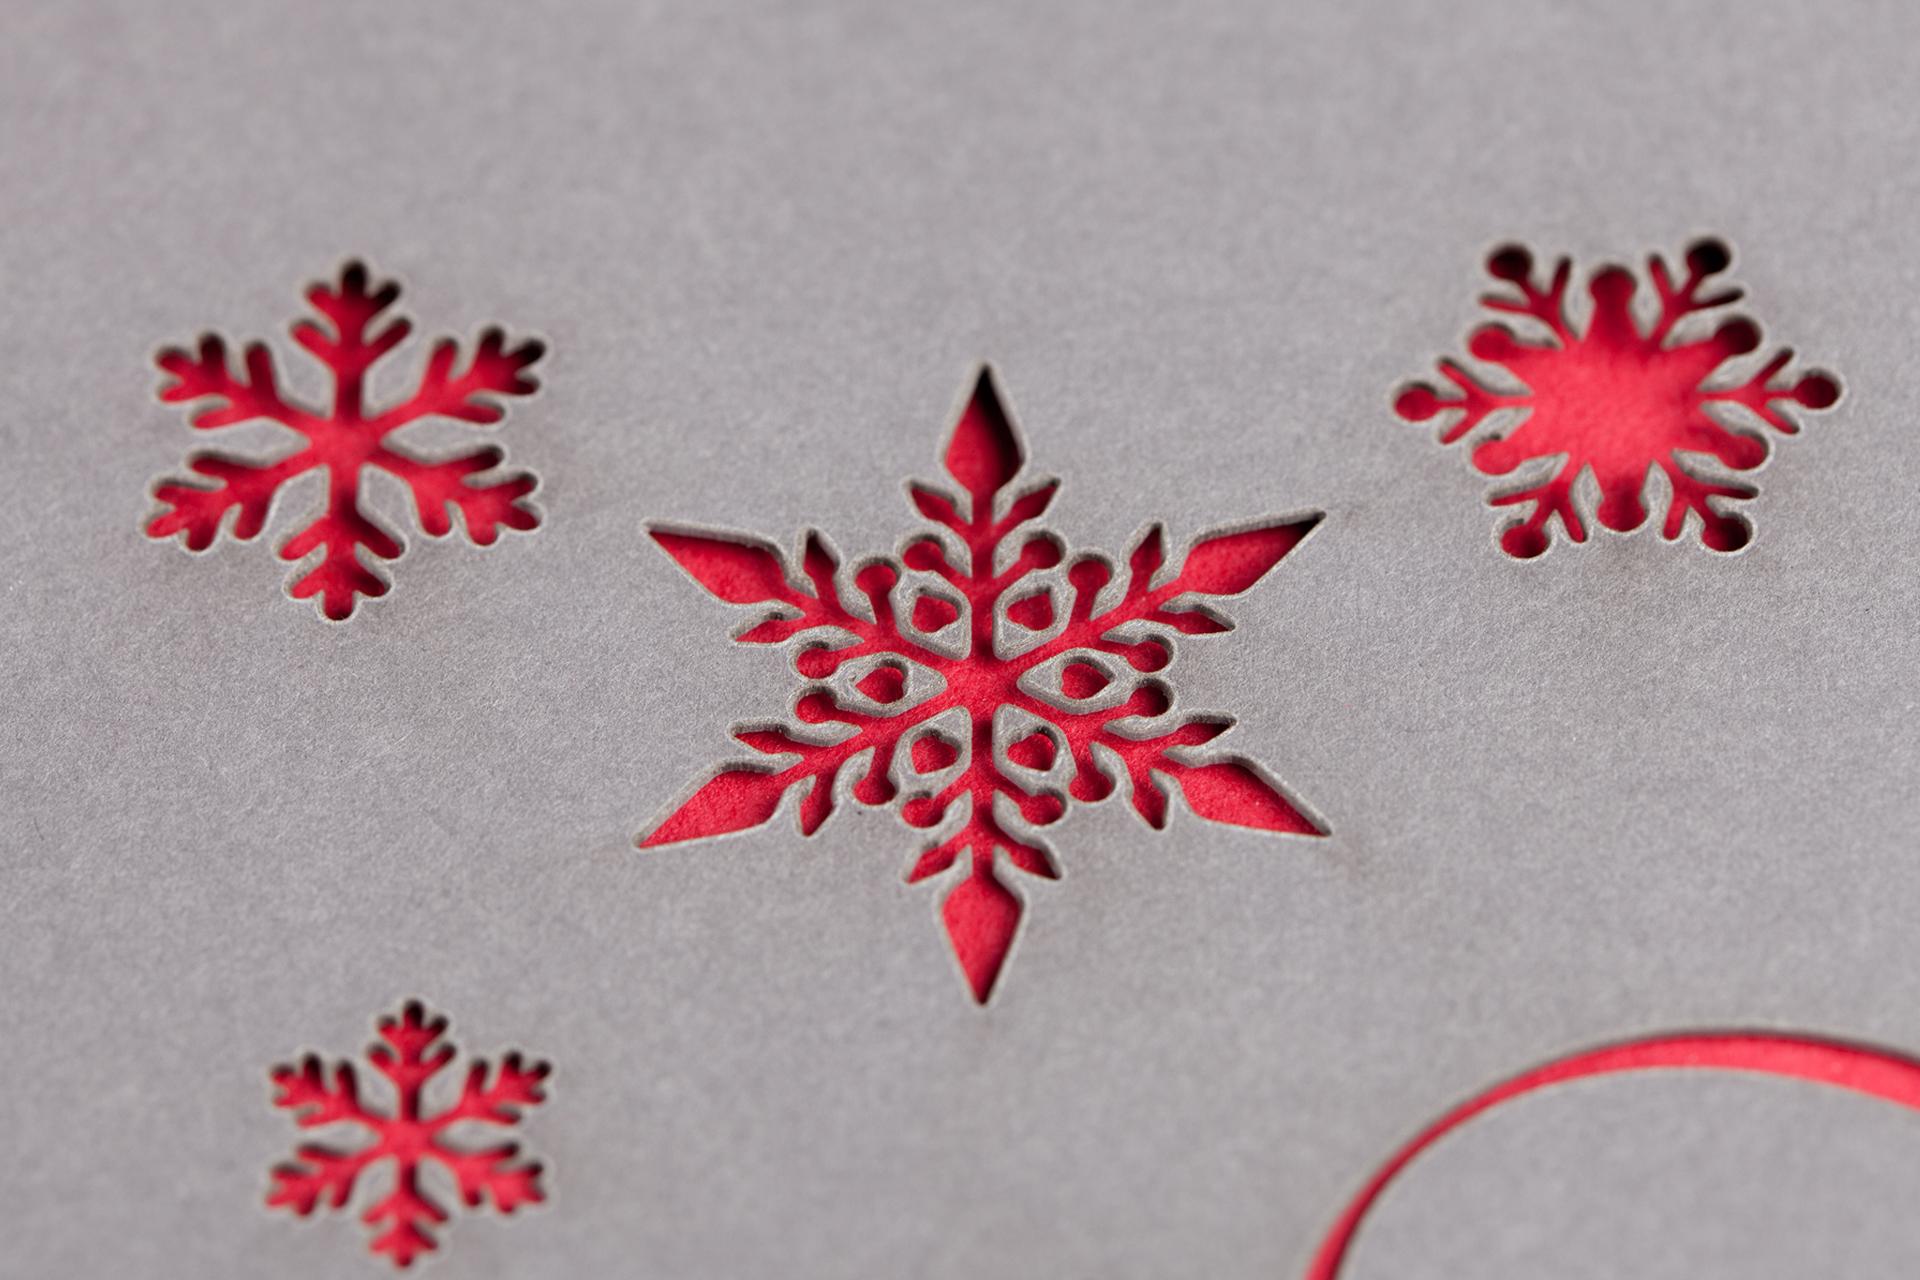 Schneeflocke laser geschnitten aus Papier